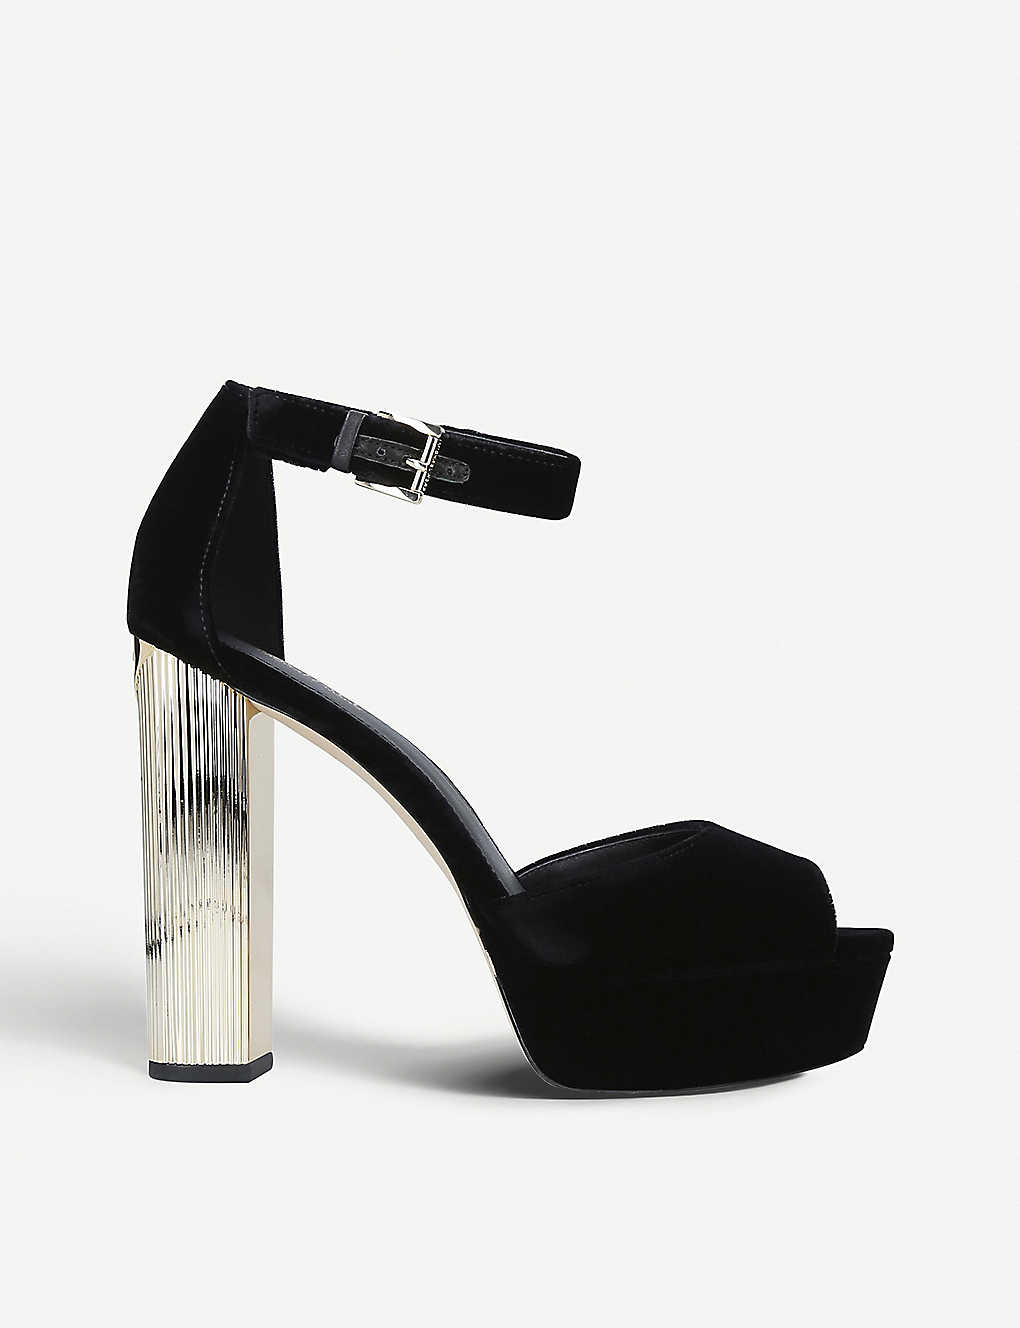 caab986209 MICHAEL MICHAEL KORS - Paloma suede platform sandals | Selfridges.com